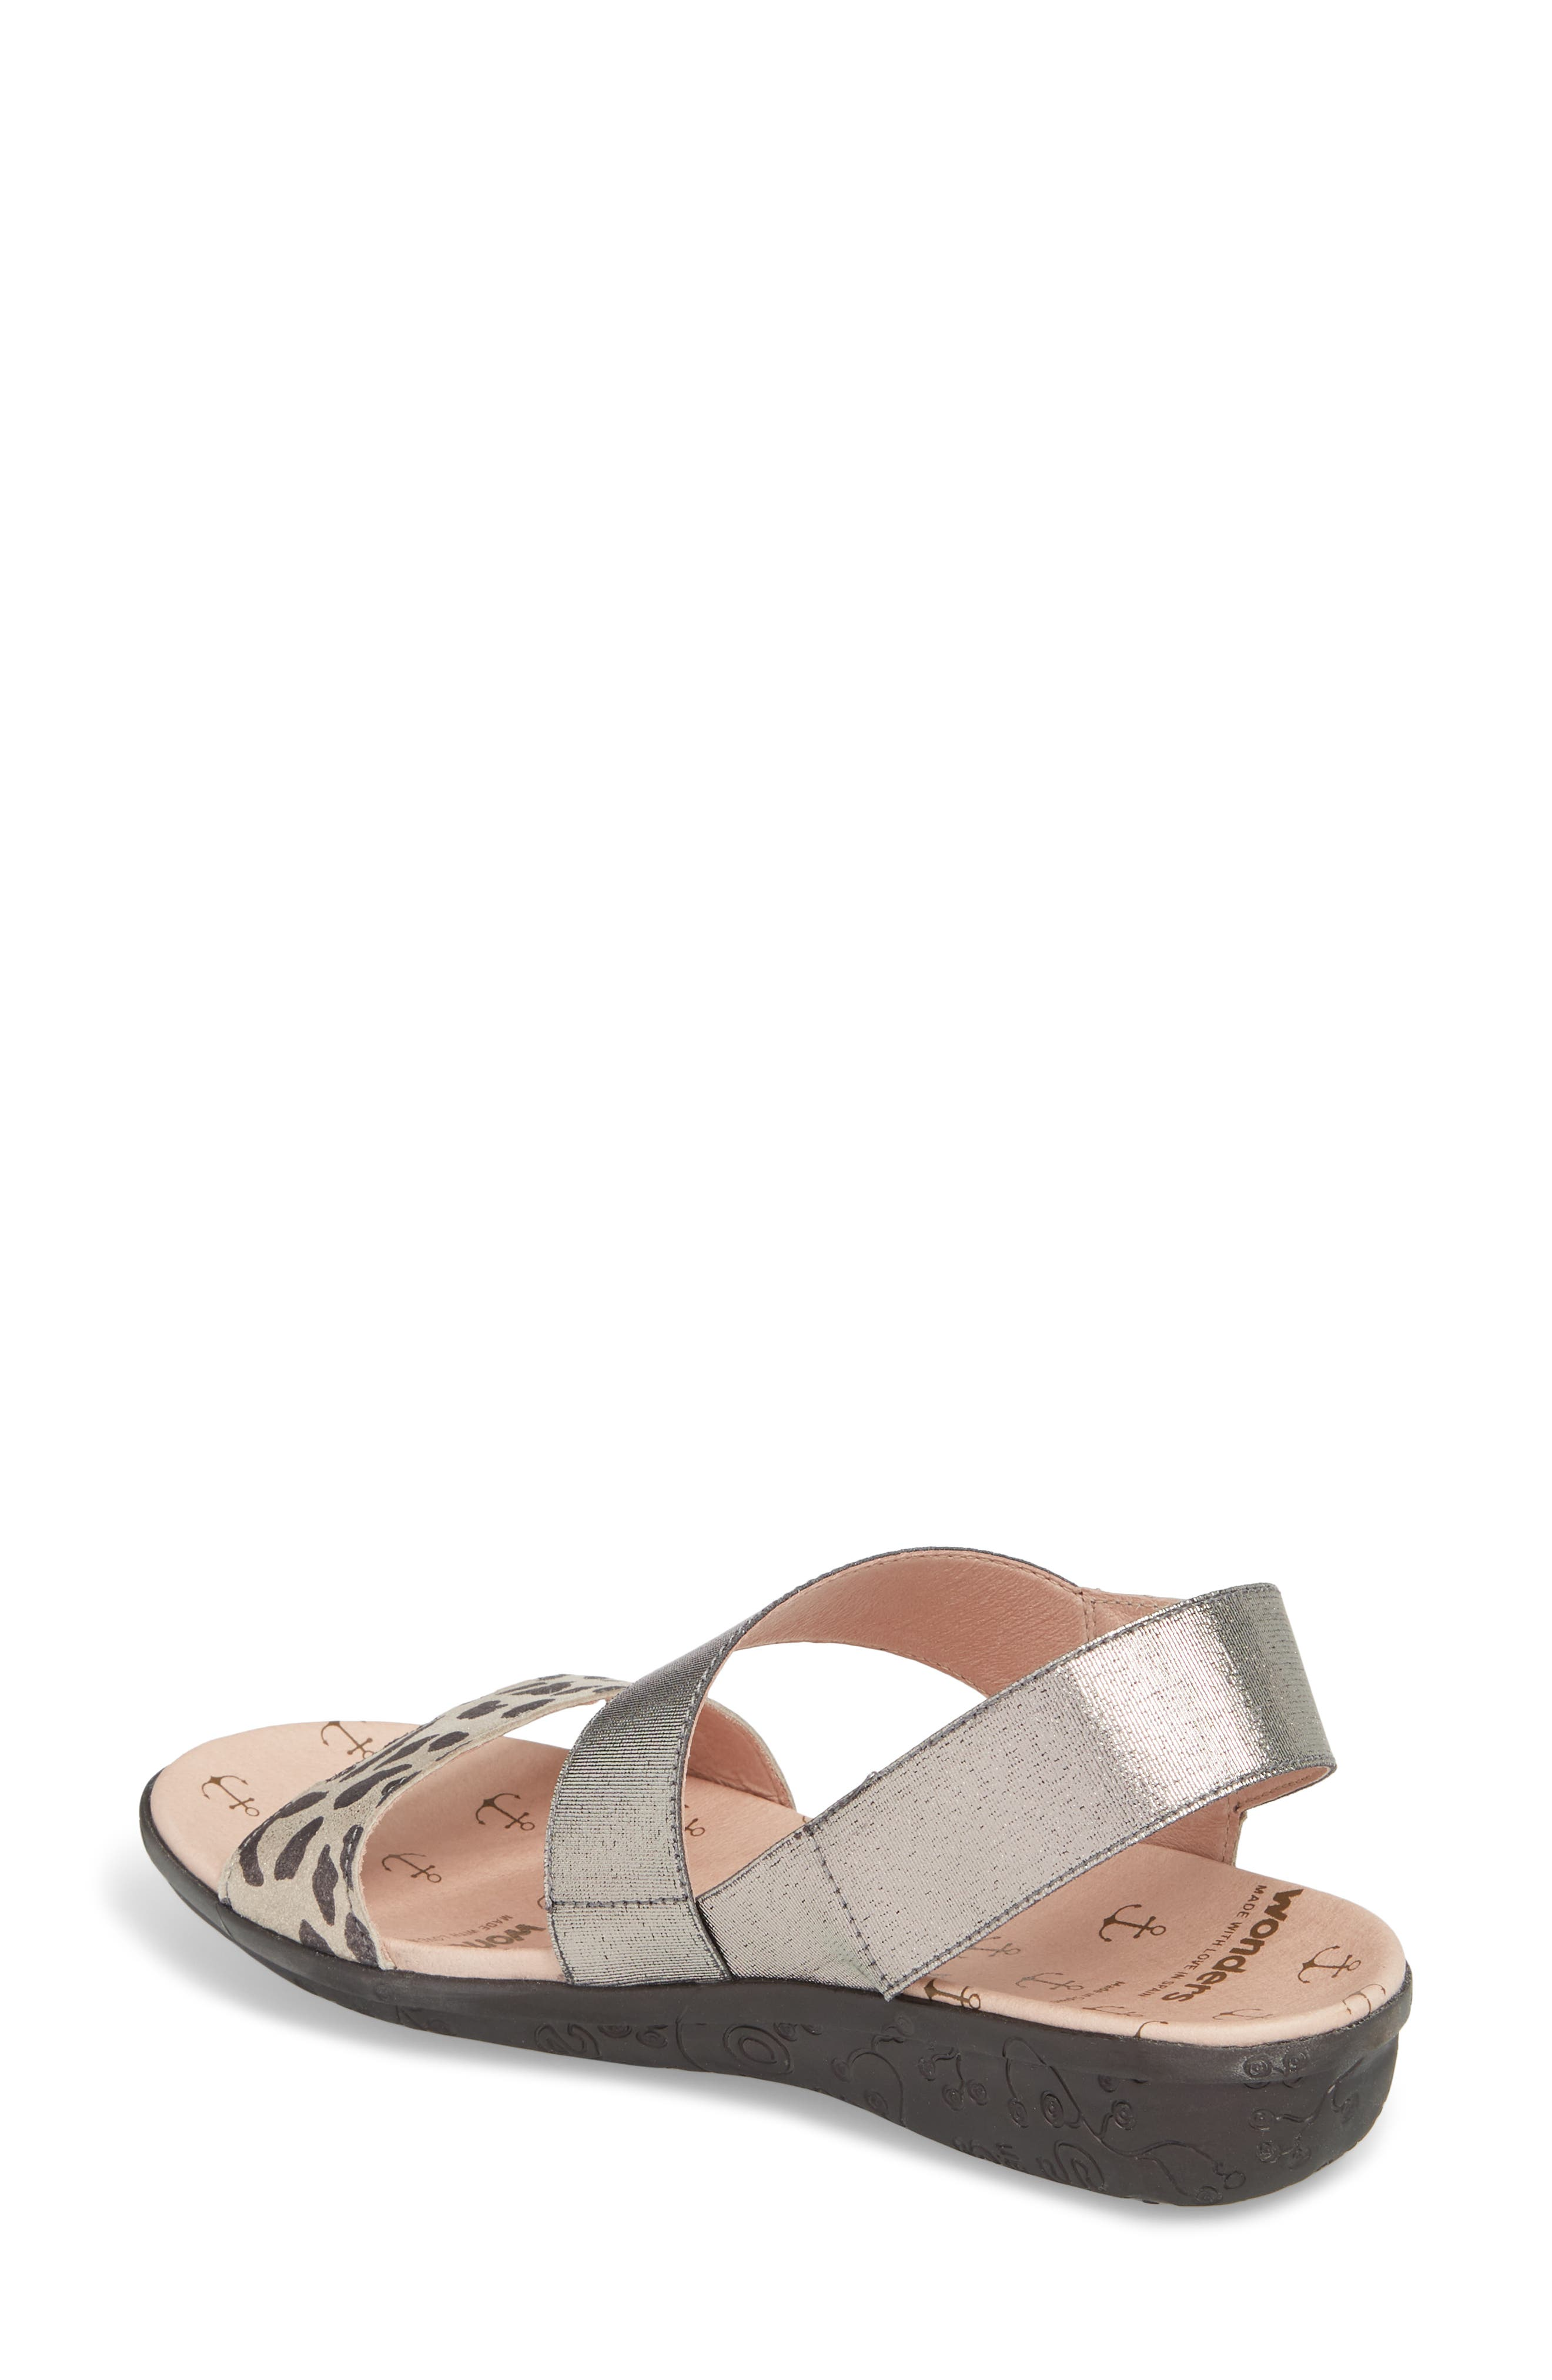 Slingback Sandal,                             Alternate thumbnail 2, color,                             Leo Leather